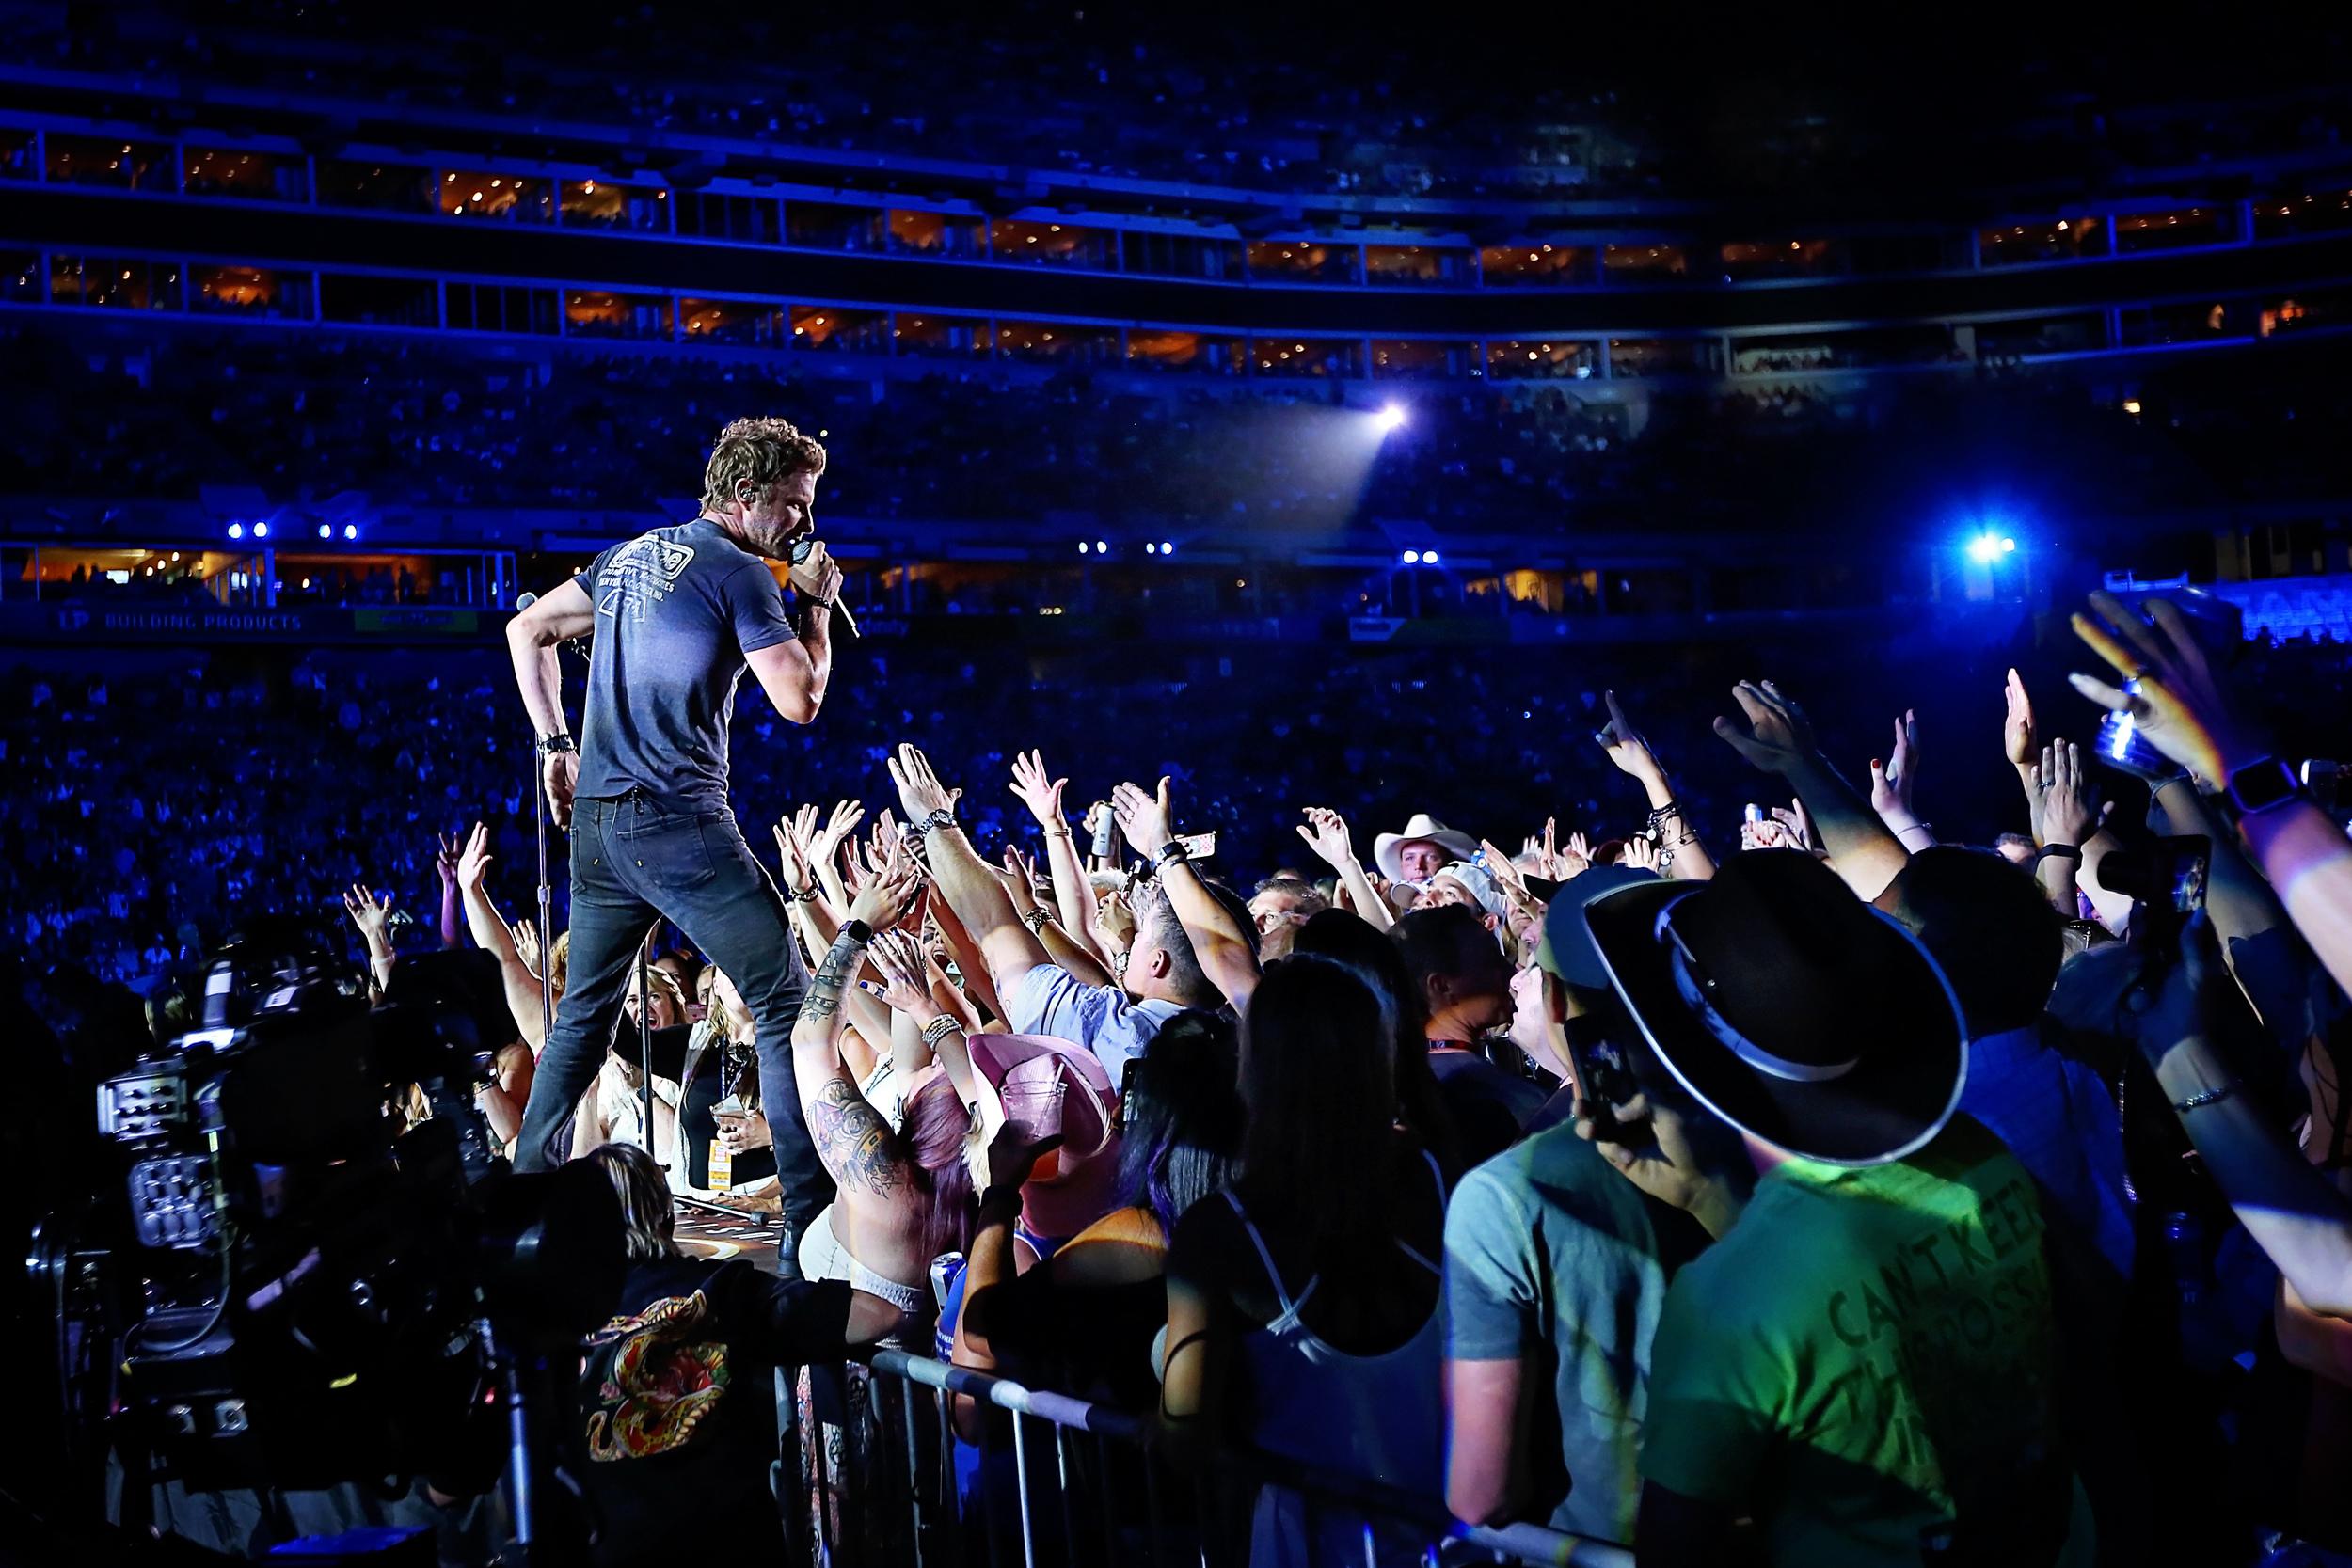 Dierks Bentley performs at Nissan Stadium during CMA Fest